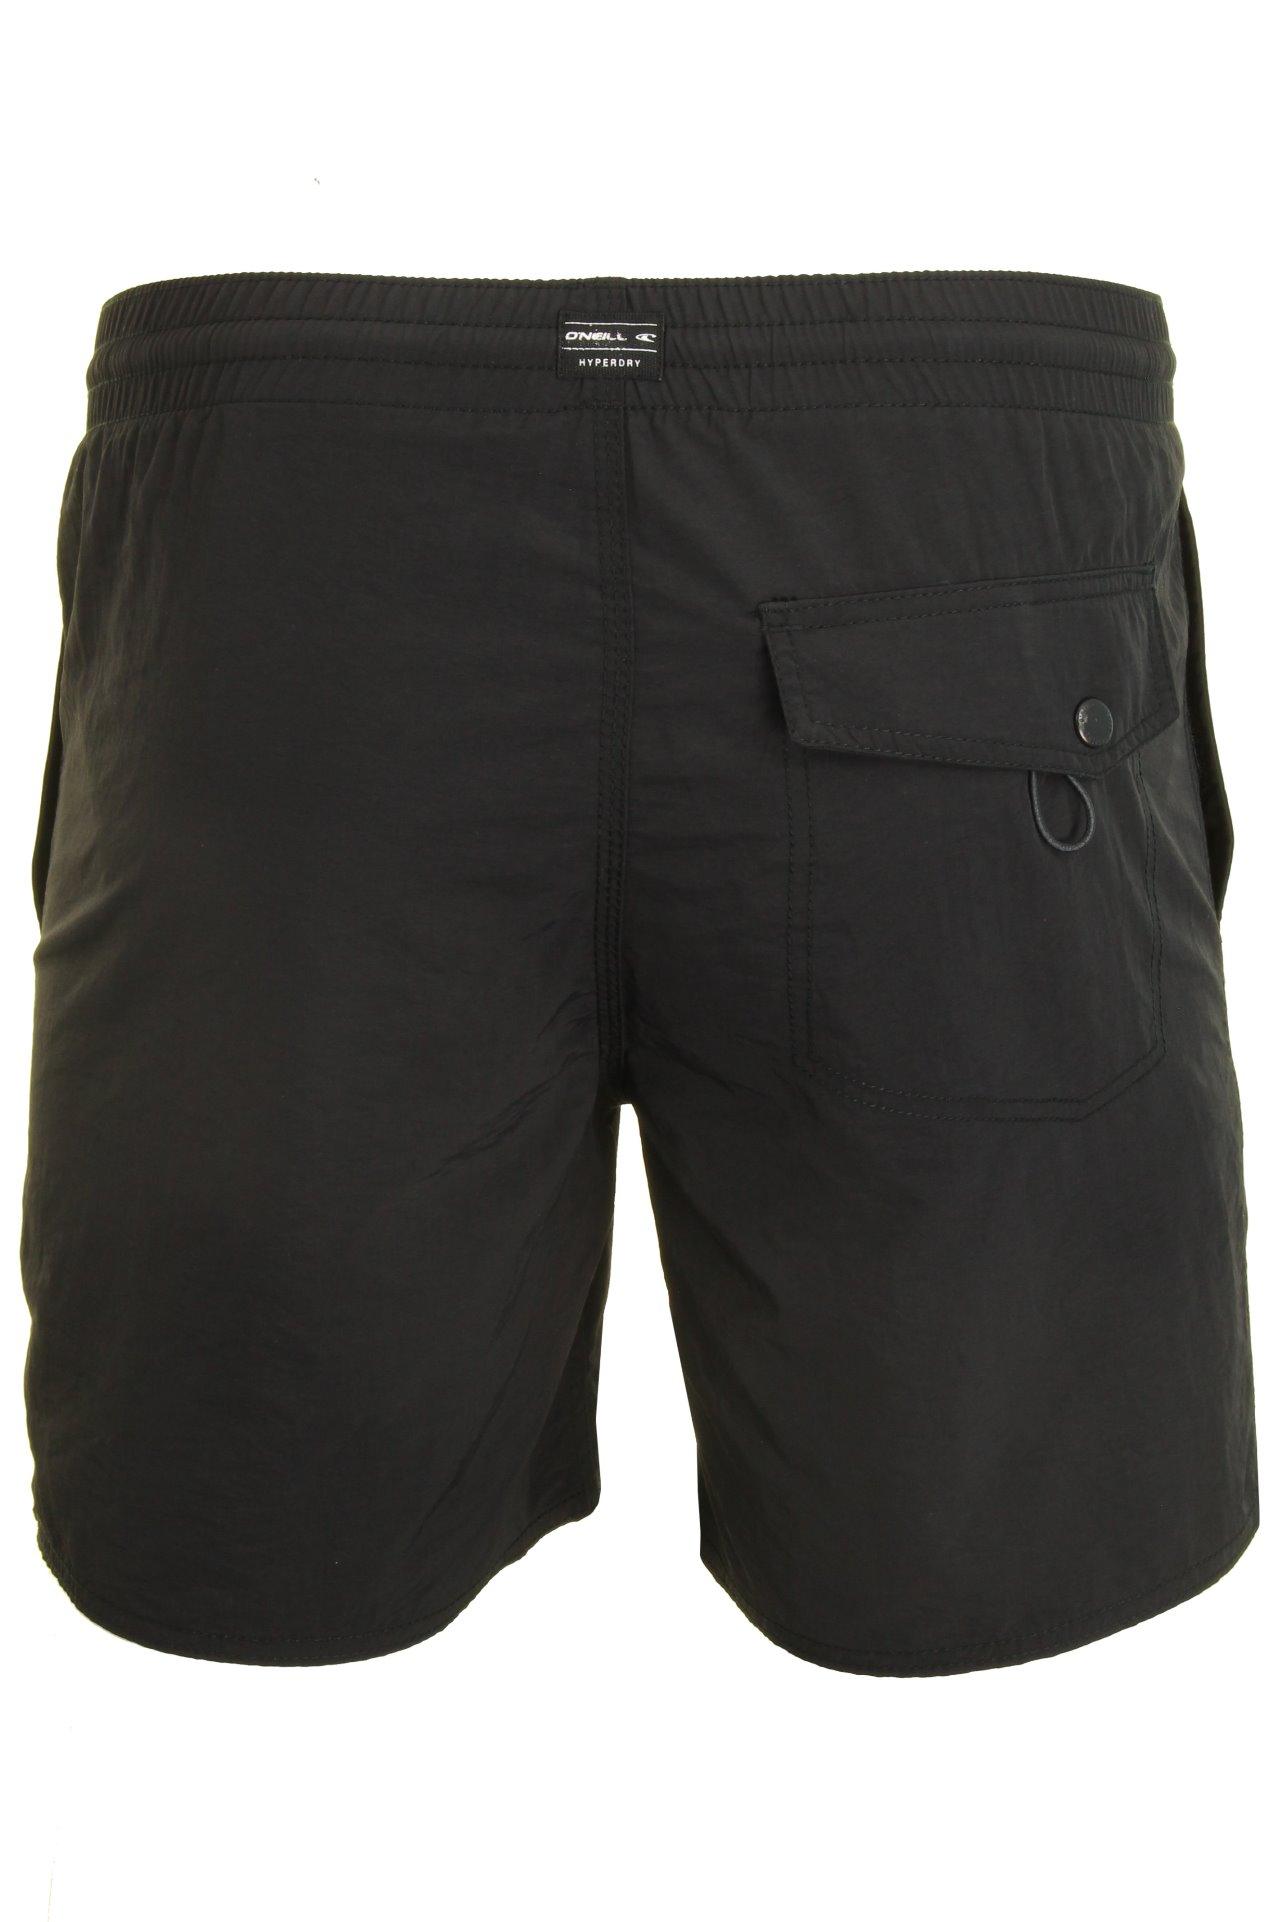 O-039-Neill-Mens-039-Vert-039-Swim-Board-Shorts thumbnail 8